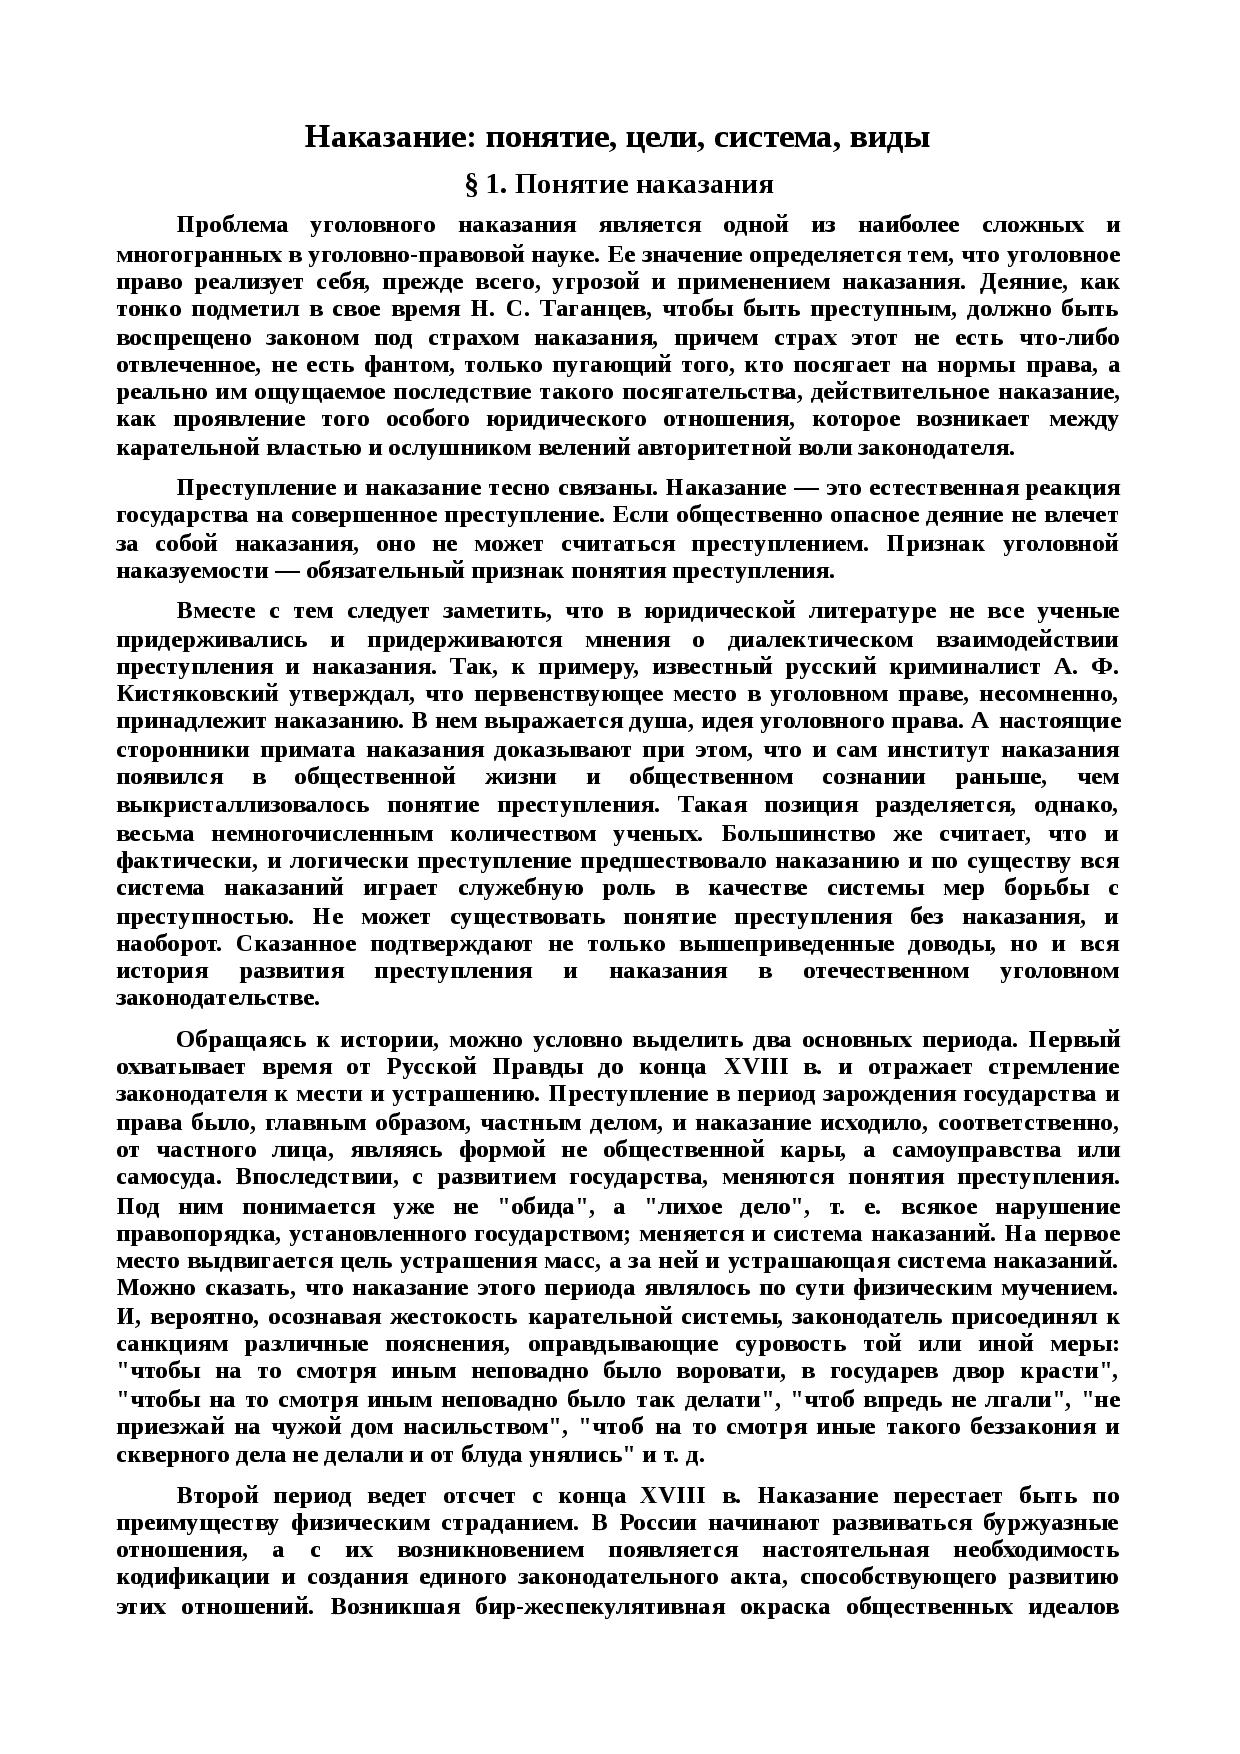 Признаки уголовного наказания